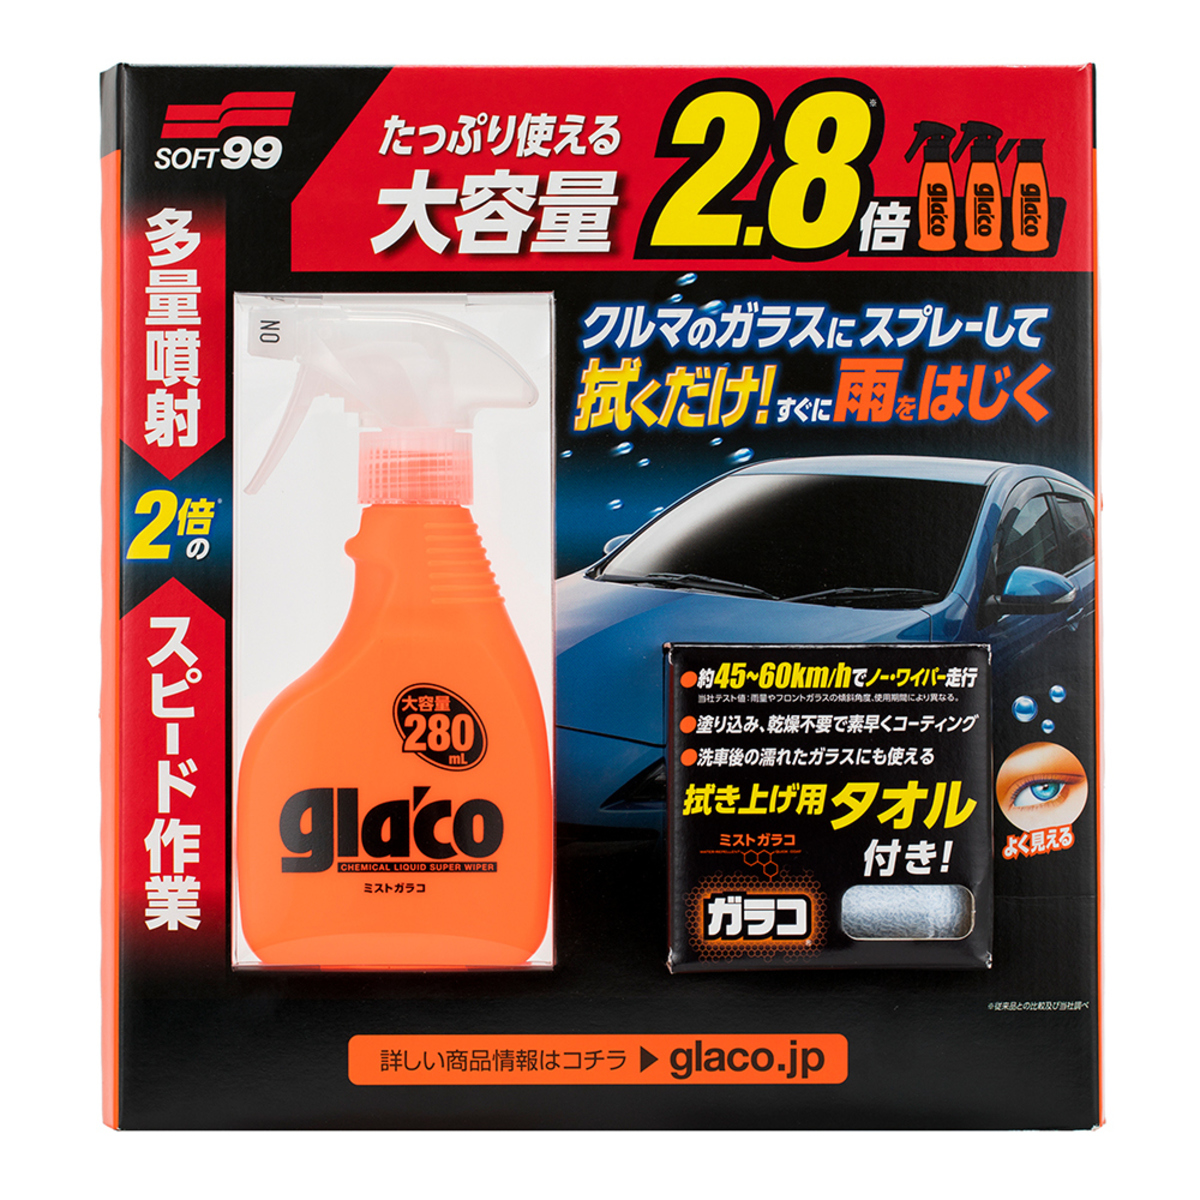 Soft99 Glaco 噴霧型玻璃驅水劑 280ML